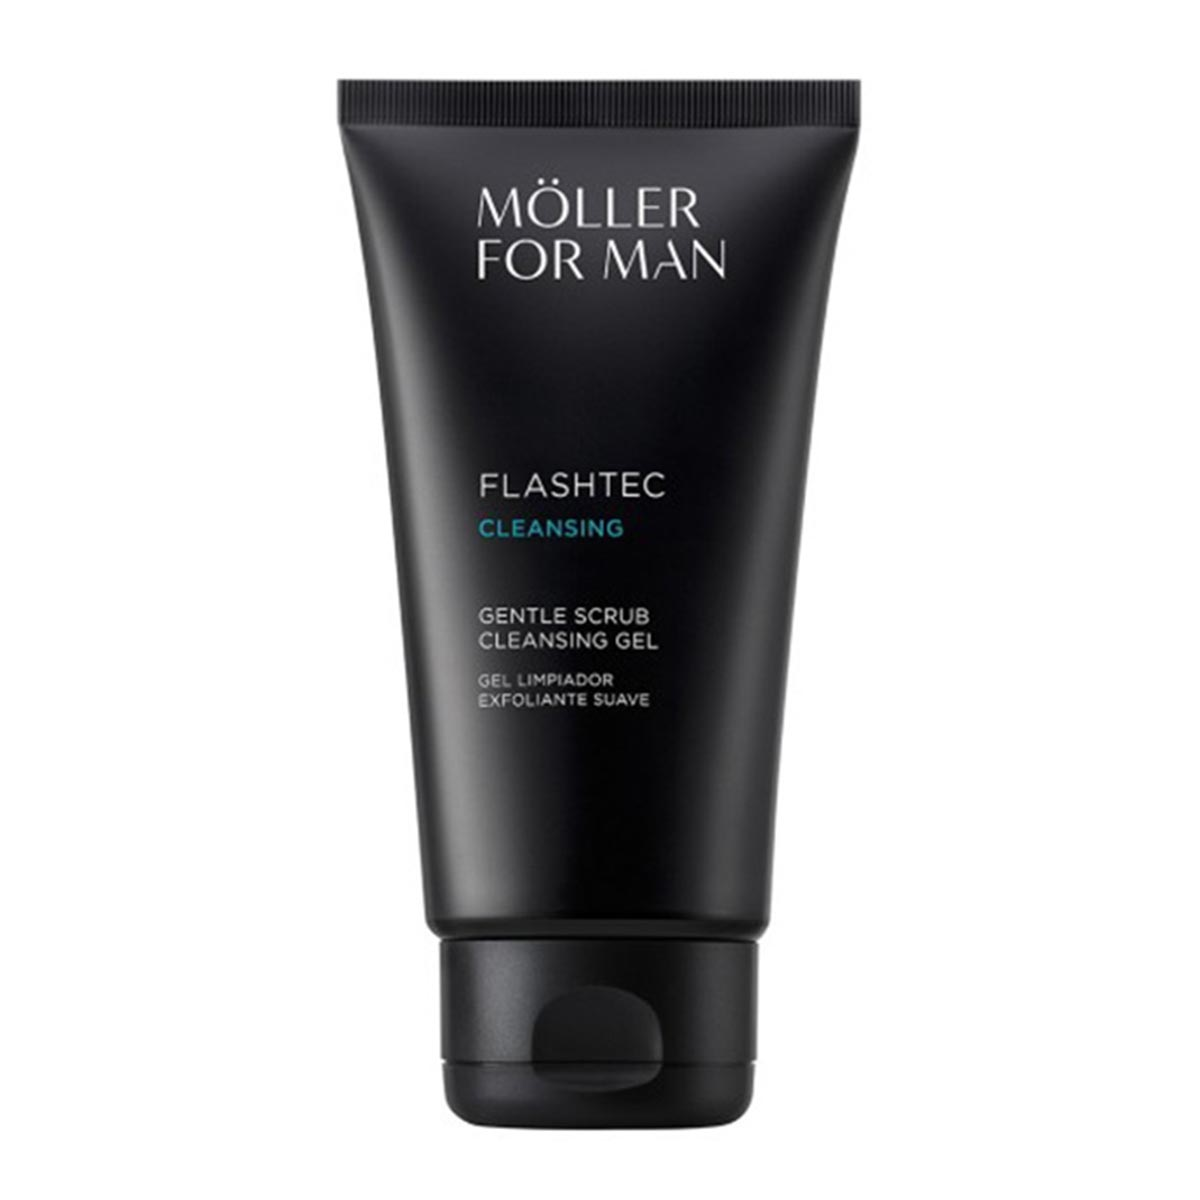 Anne moller for man flashtec cleansing gel 125ml